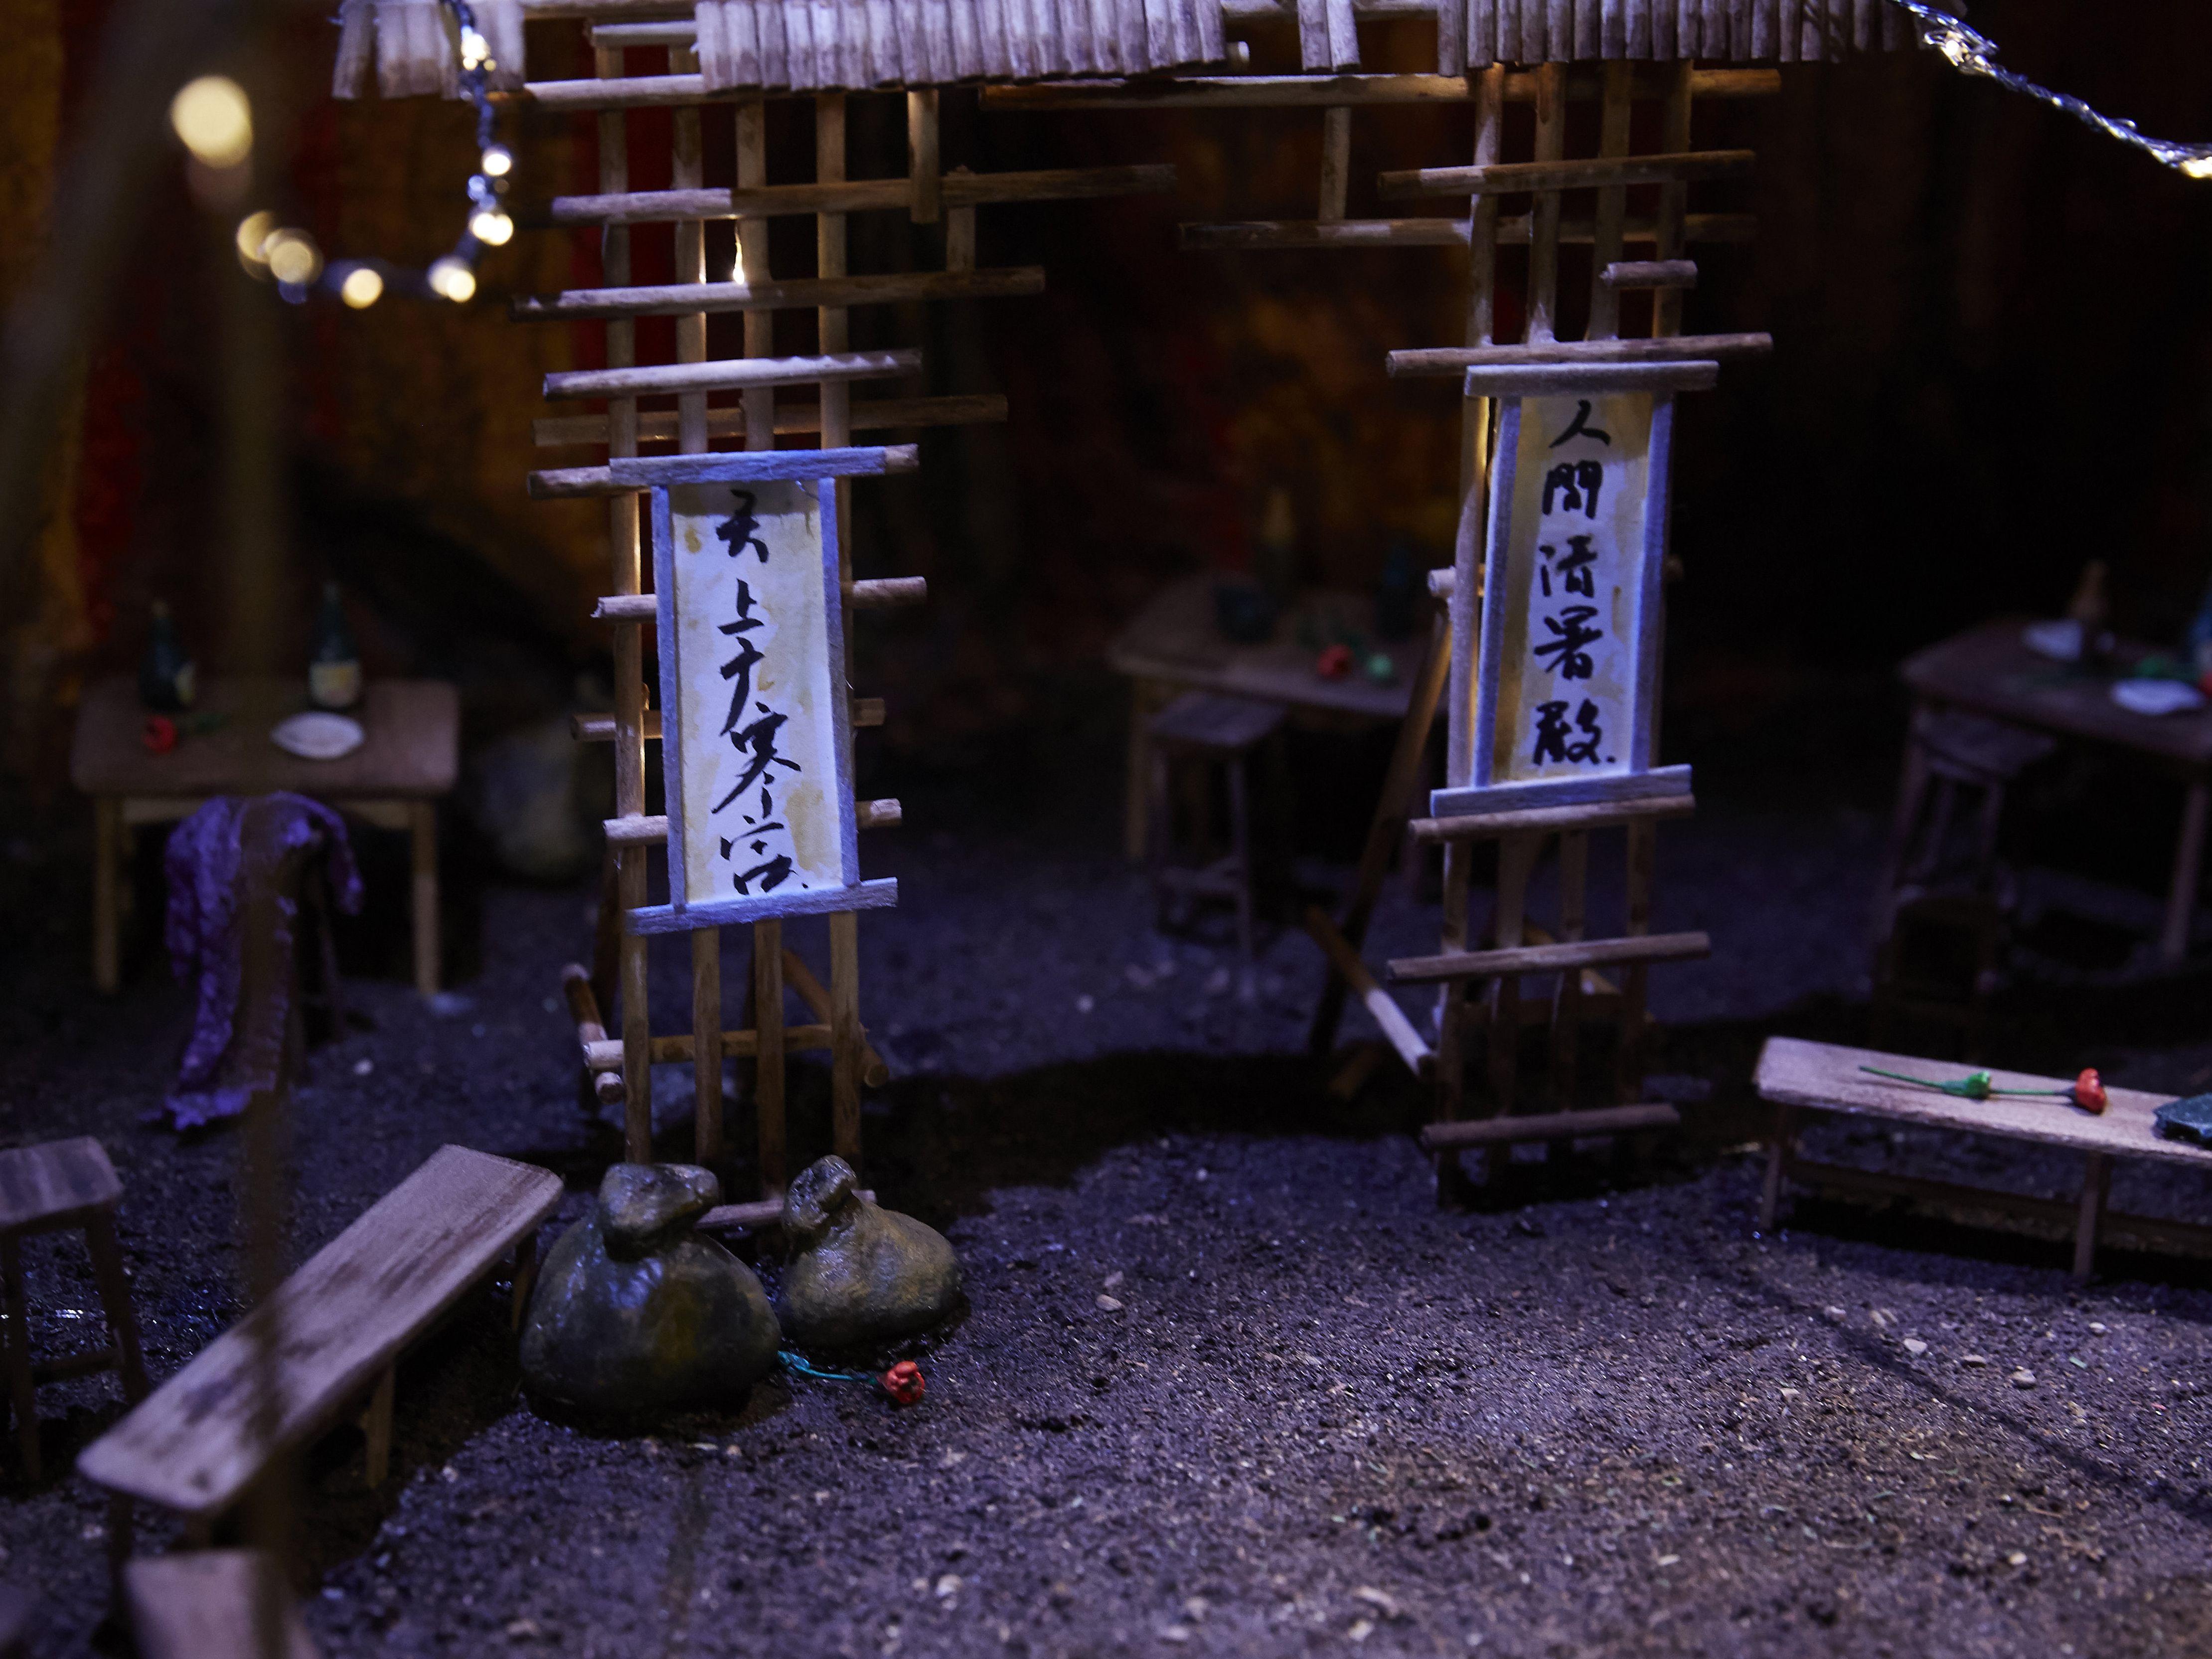 Set model by Yun Geng.